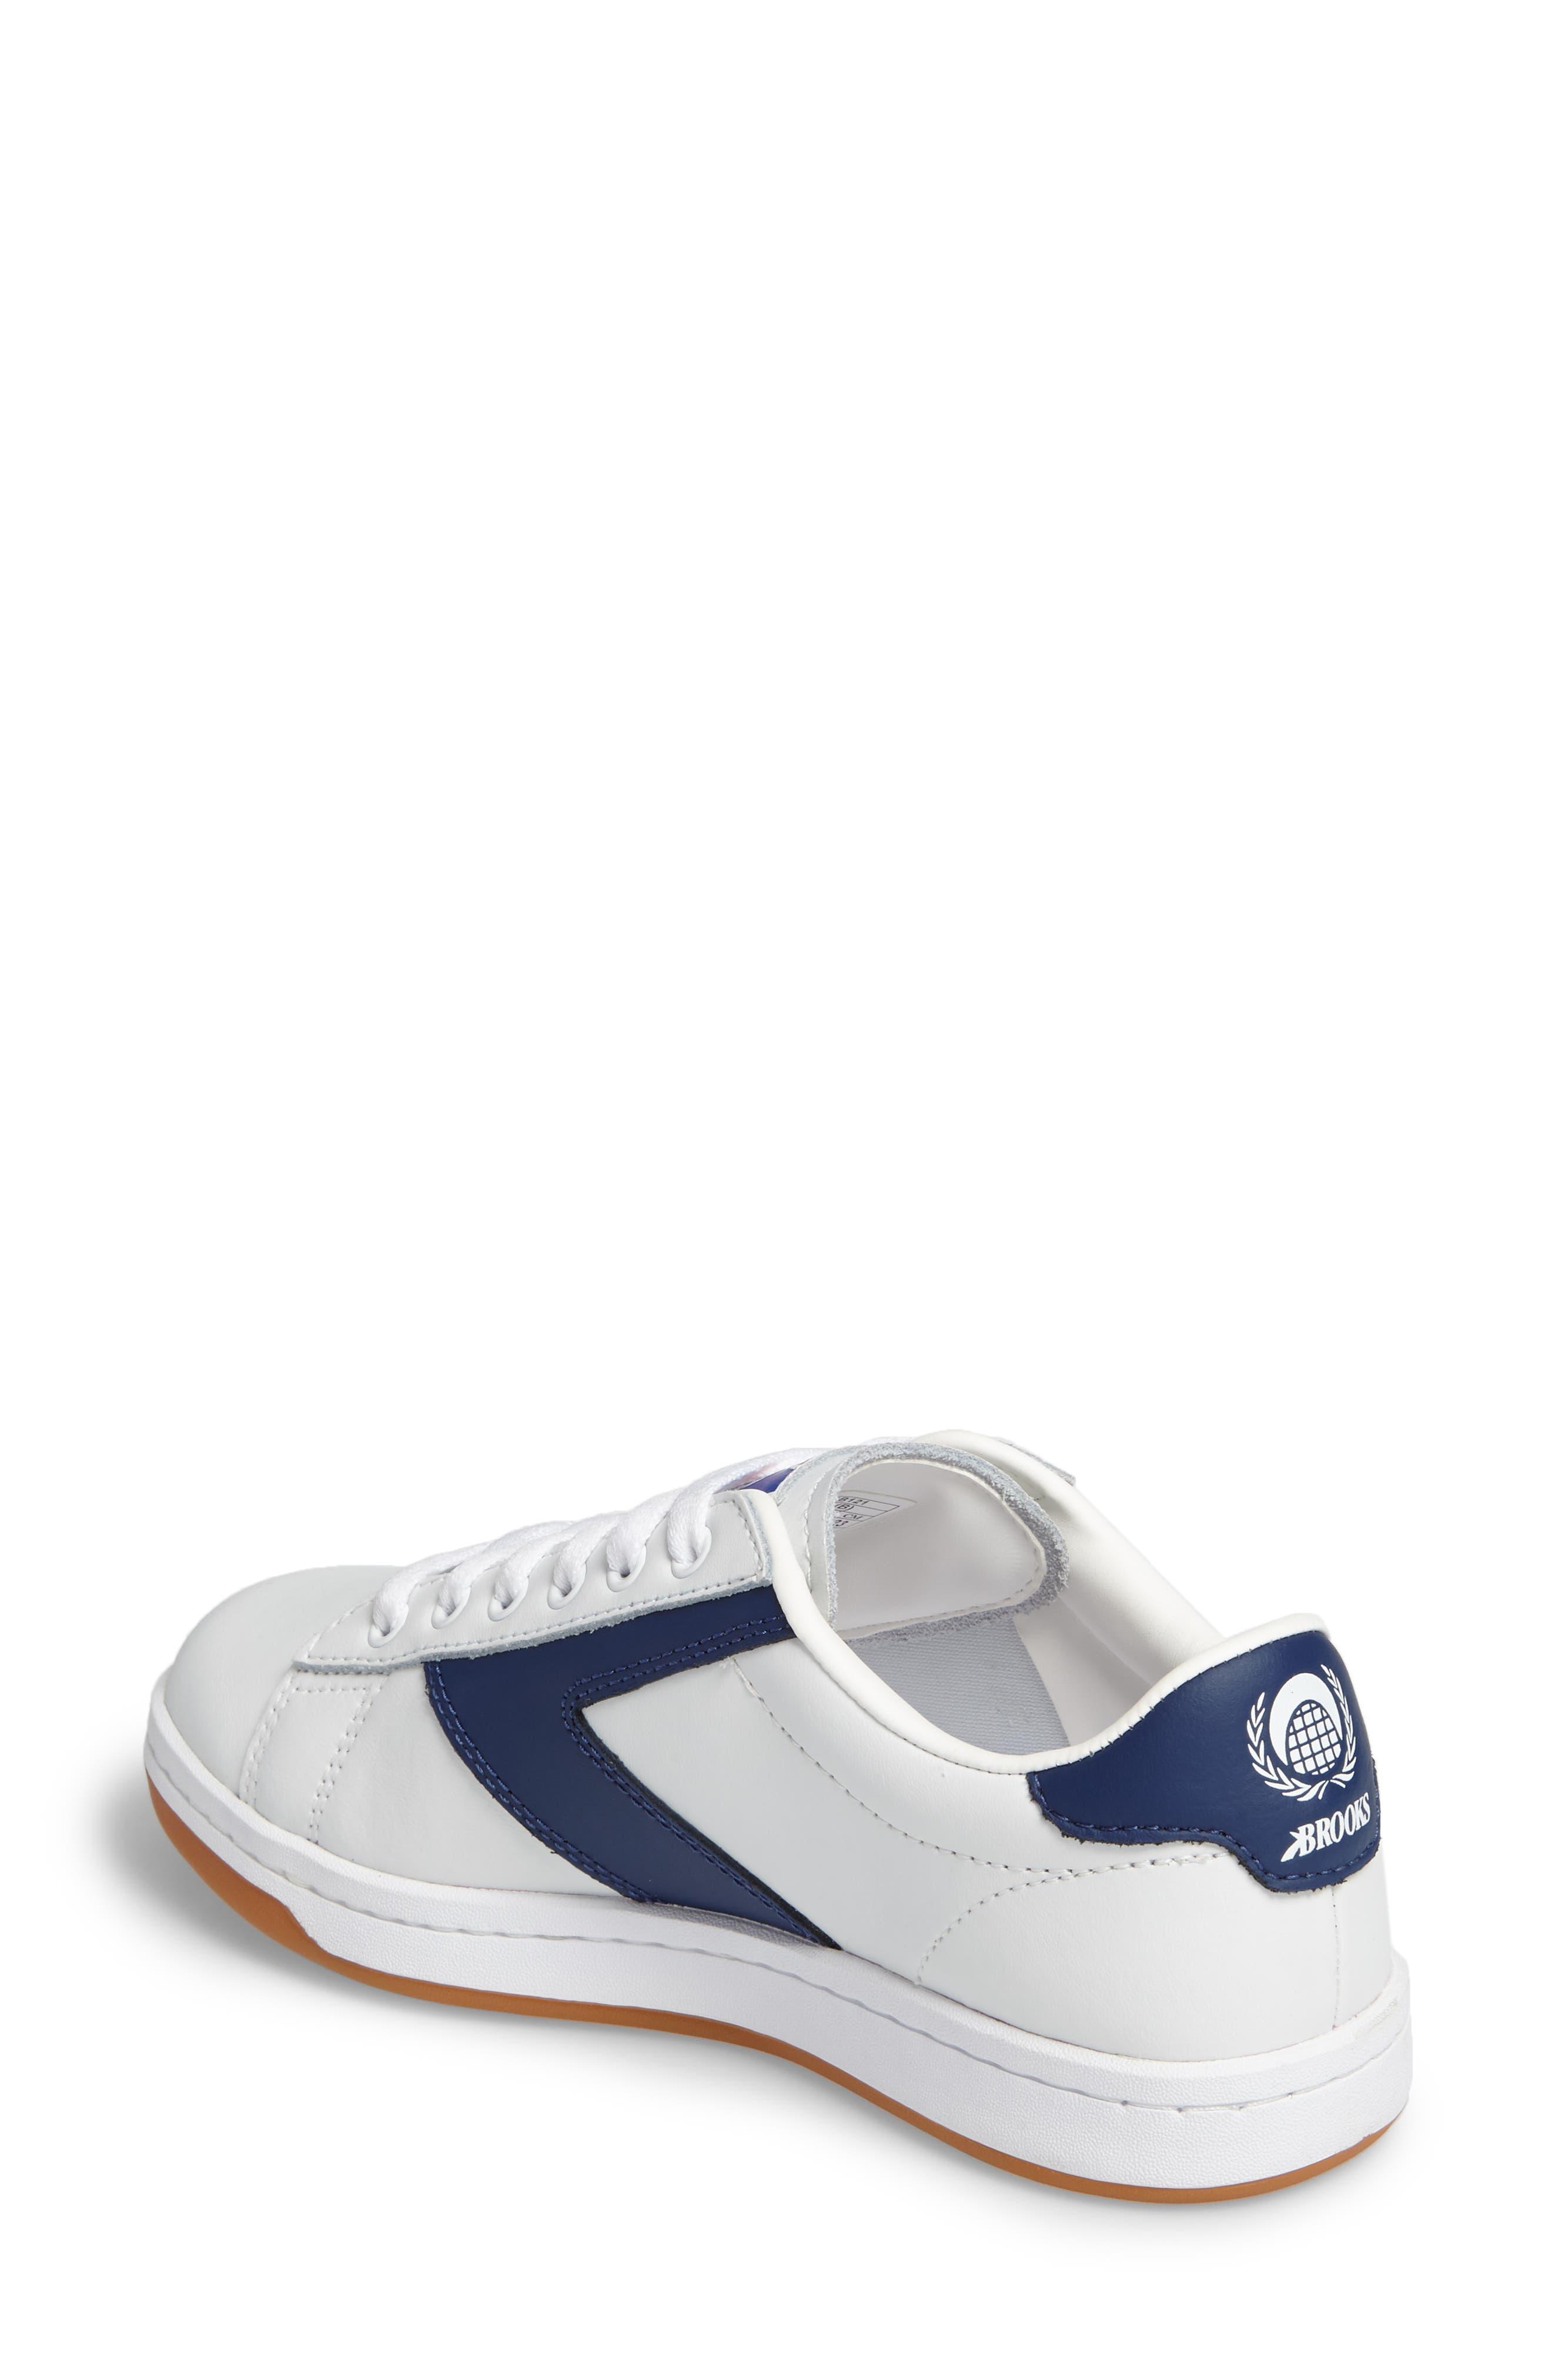 Court Renshaw Sneaker,                             Alternate thumbnail 2, color,                             121